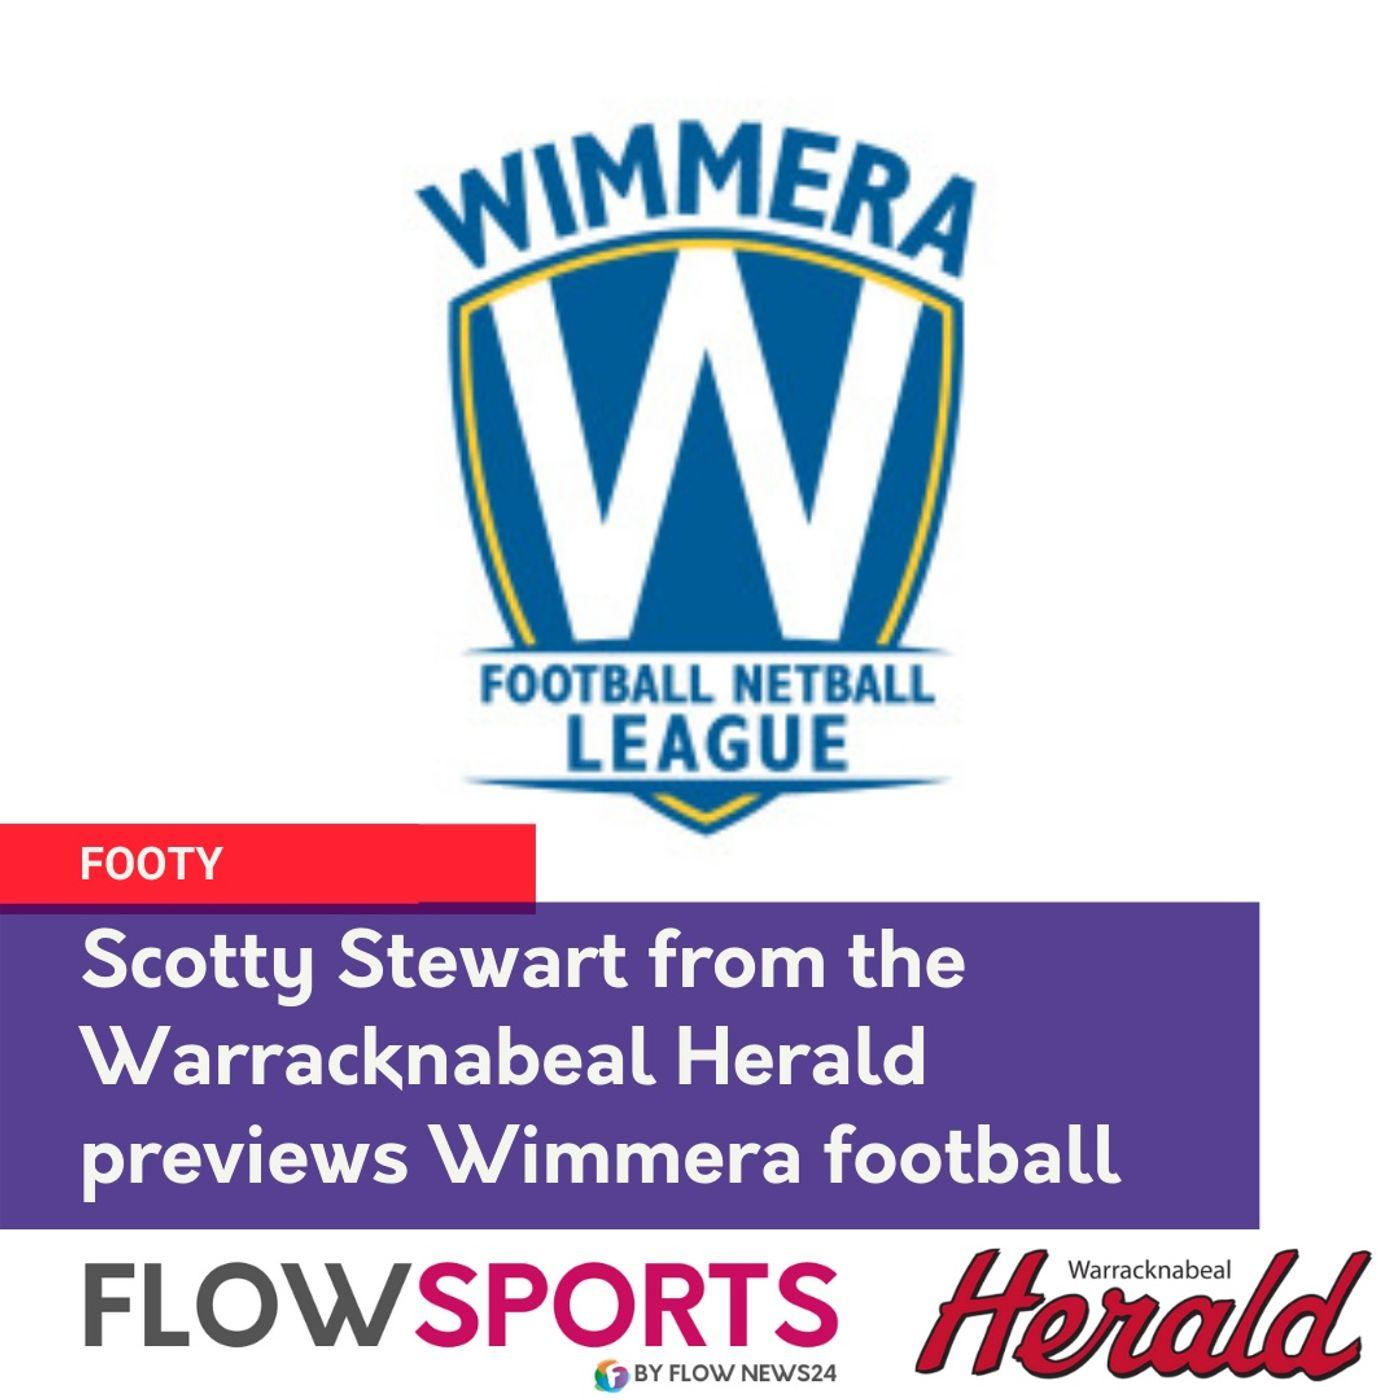 Scotty Stewart previews round 8 matches in Wimmera footy, with no crowds